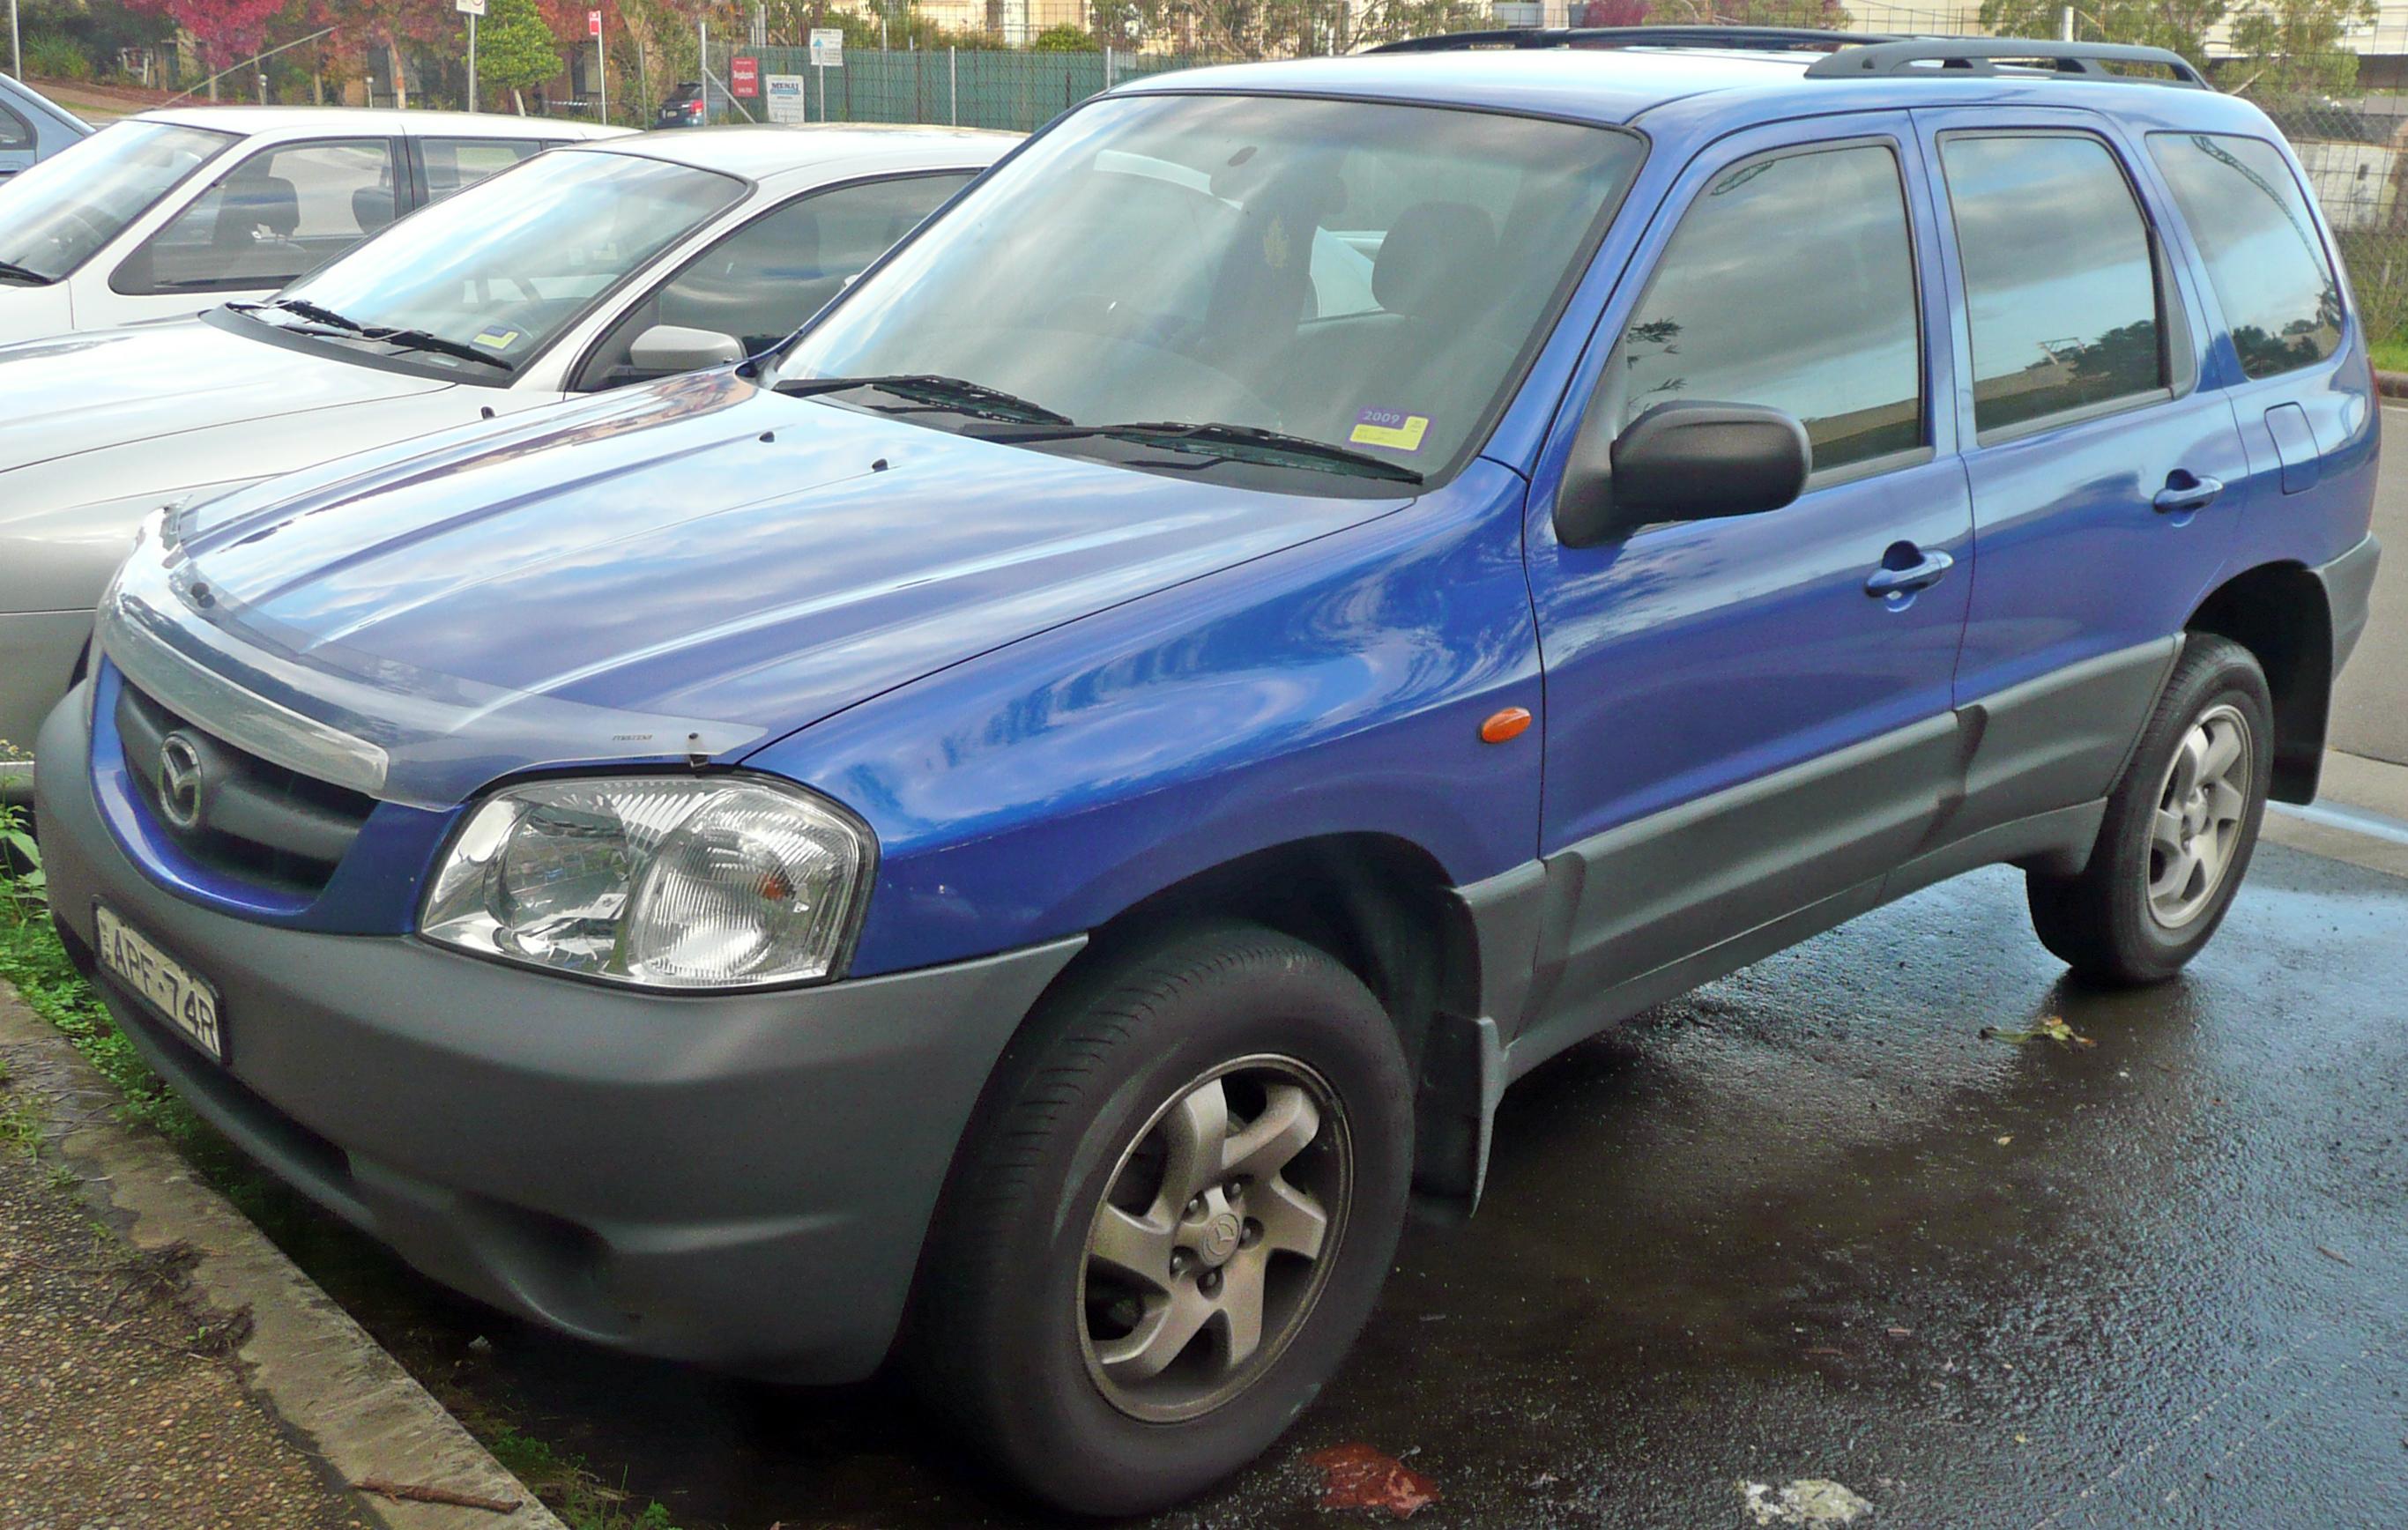 File:2003 Mazda Tribute (MY03) Limited Sport V6 wagon (2009-05-24 ...